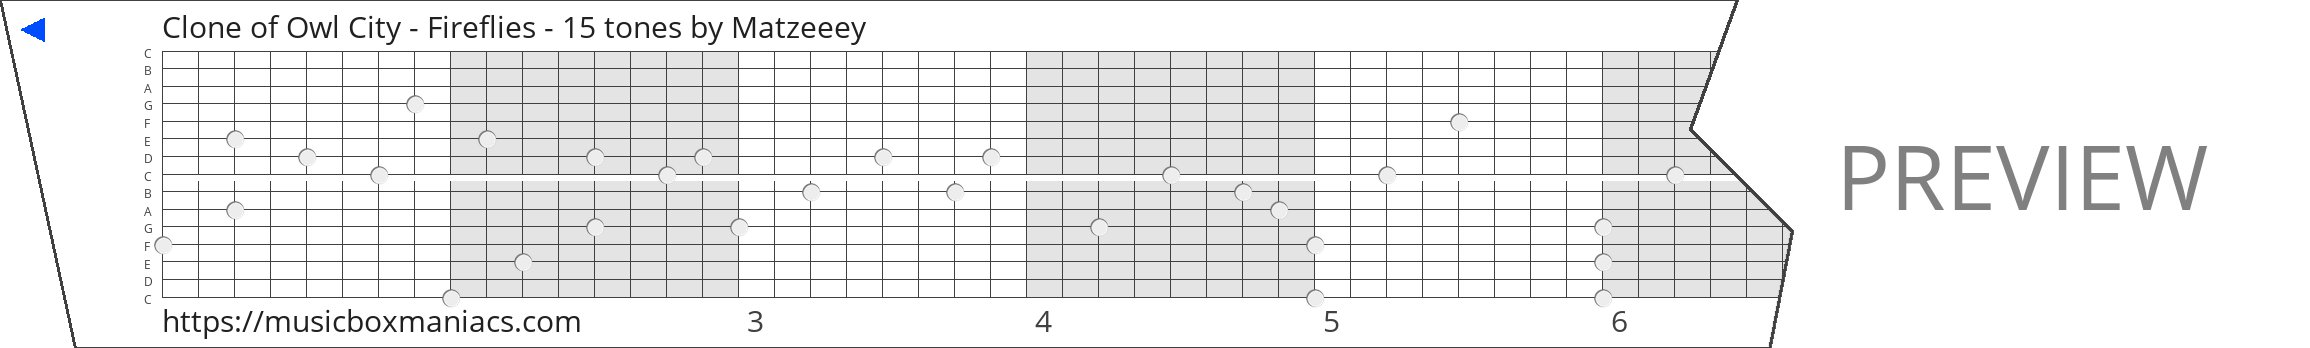 Clone of Owl City - Fireflies - 15 tones 15 note music box paper strip